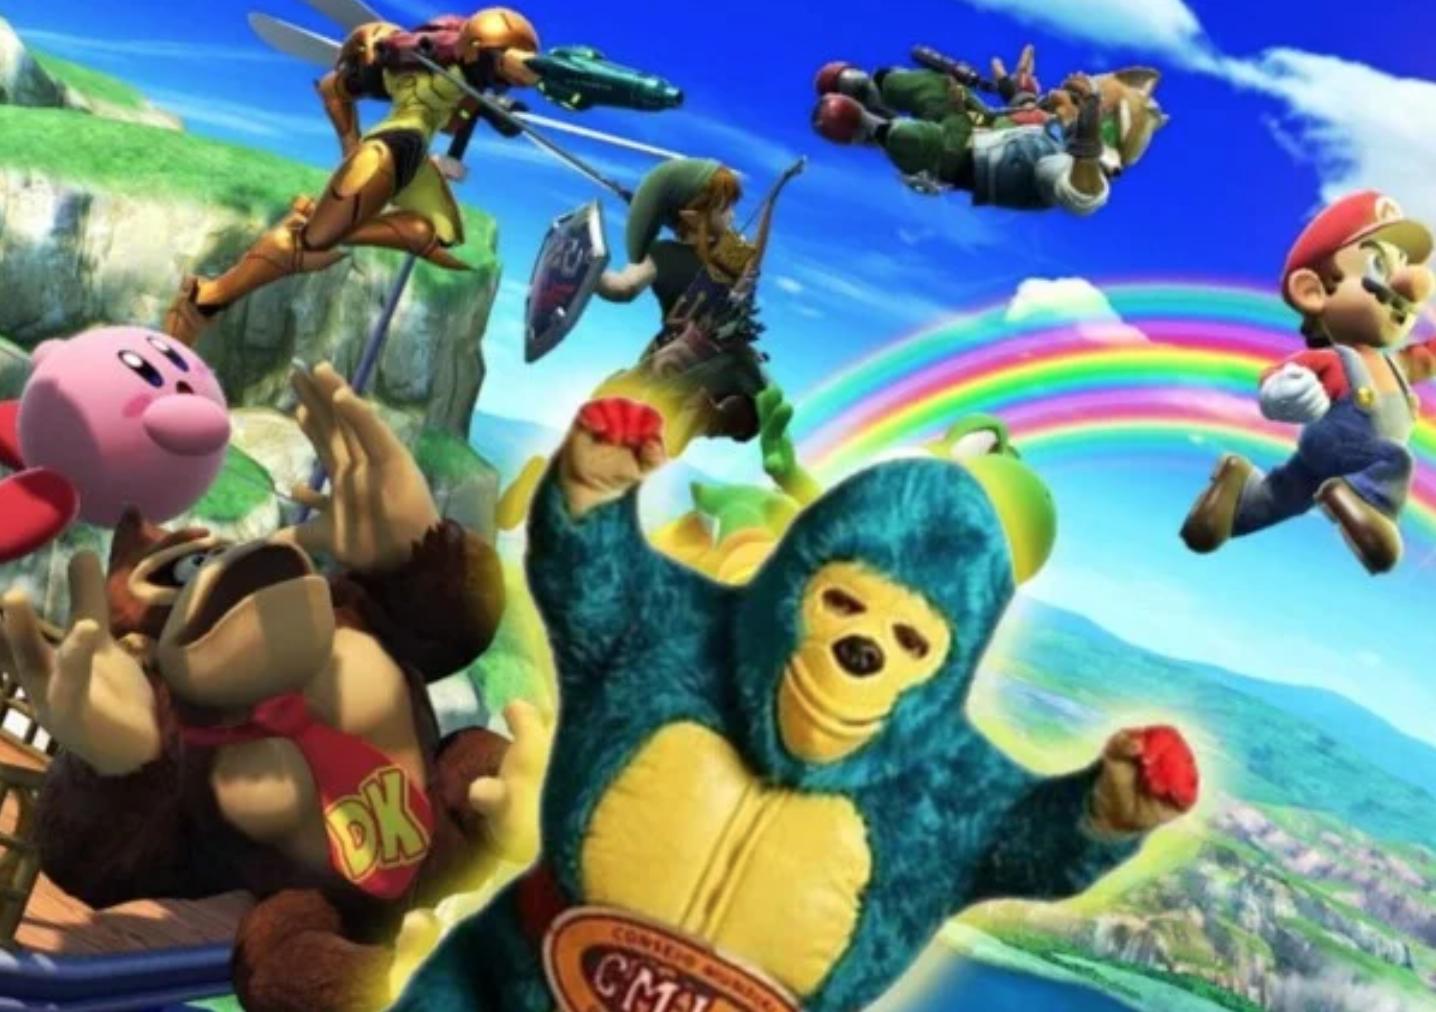 Kemonito Smash Bros